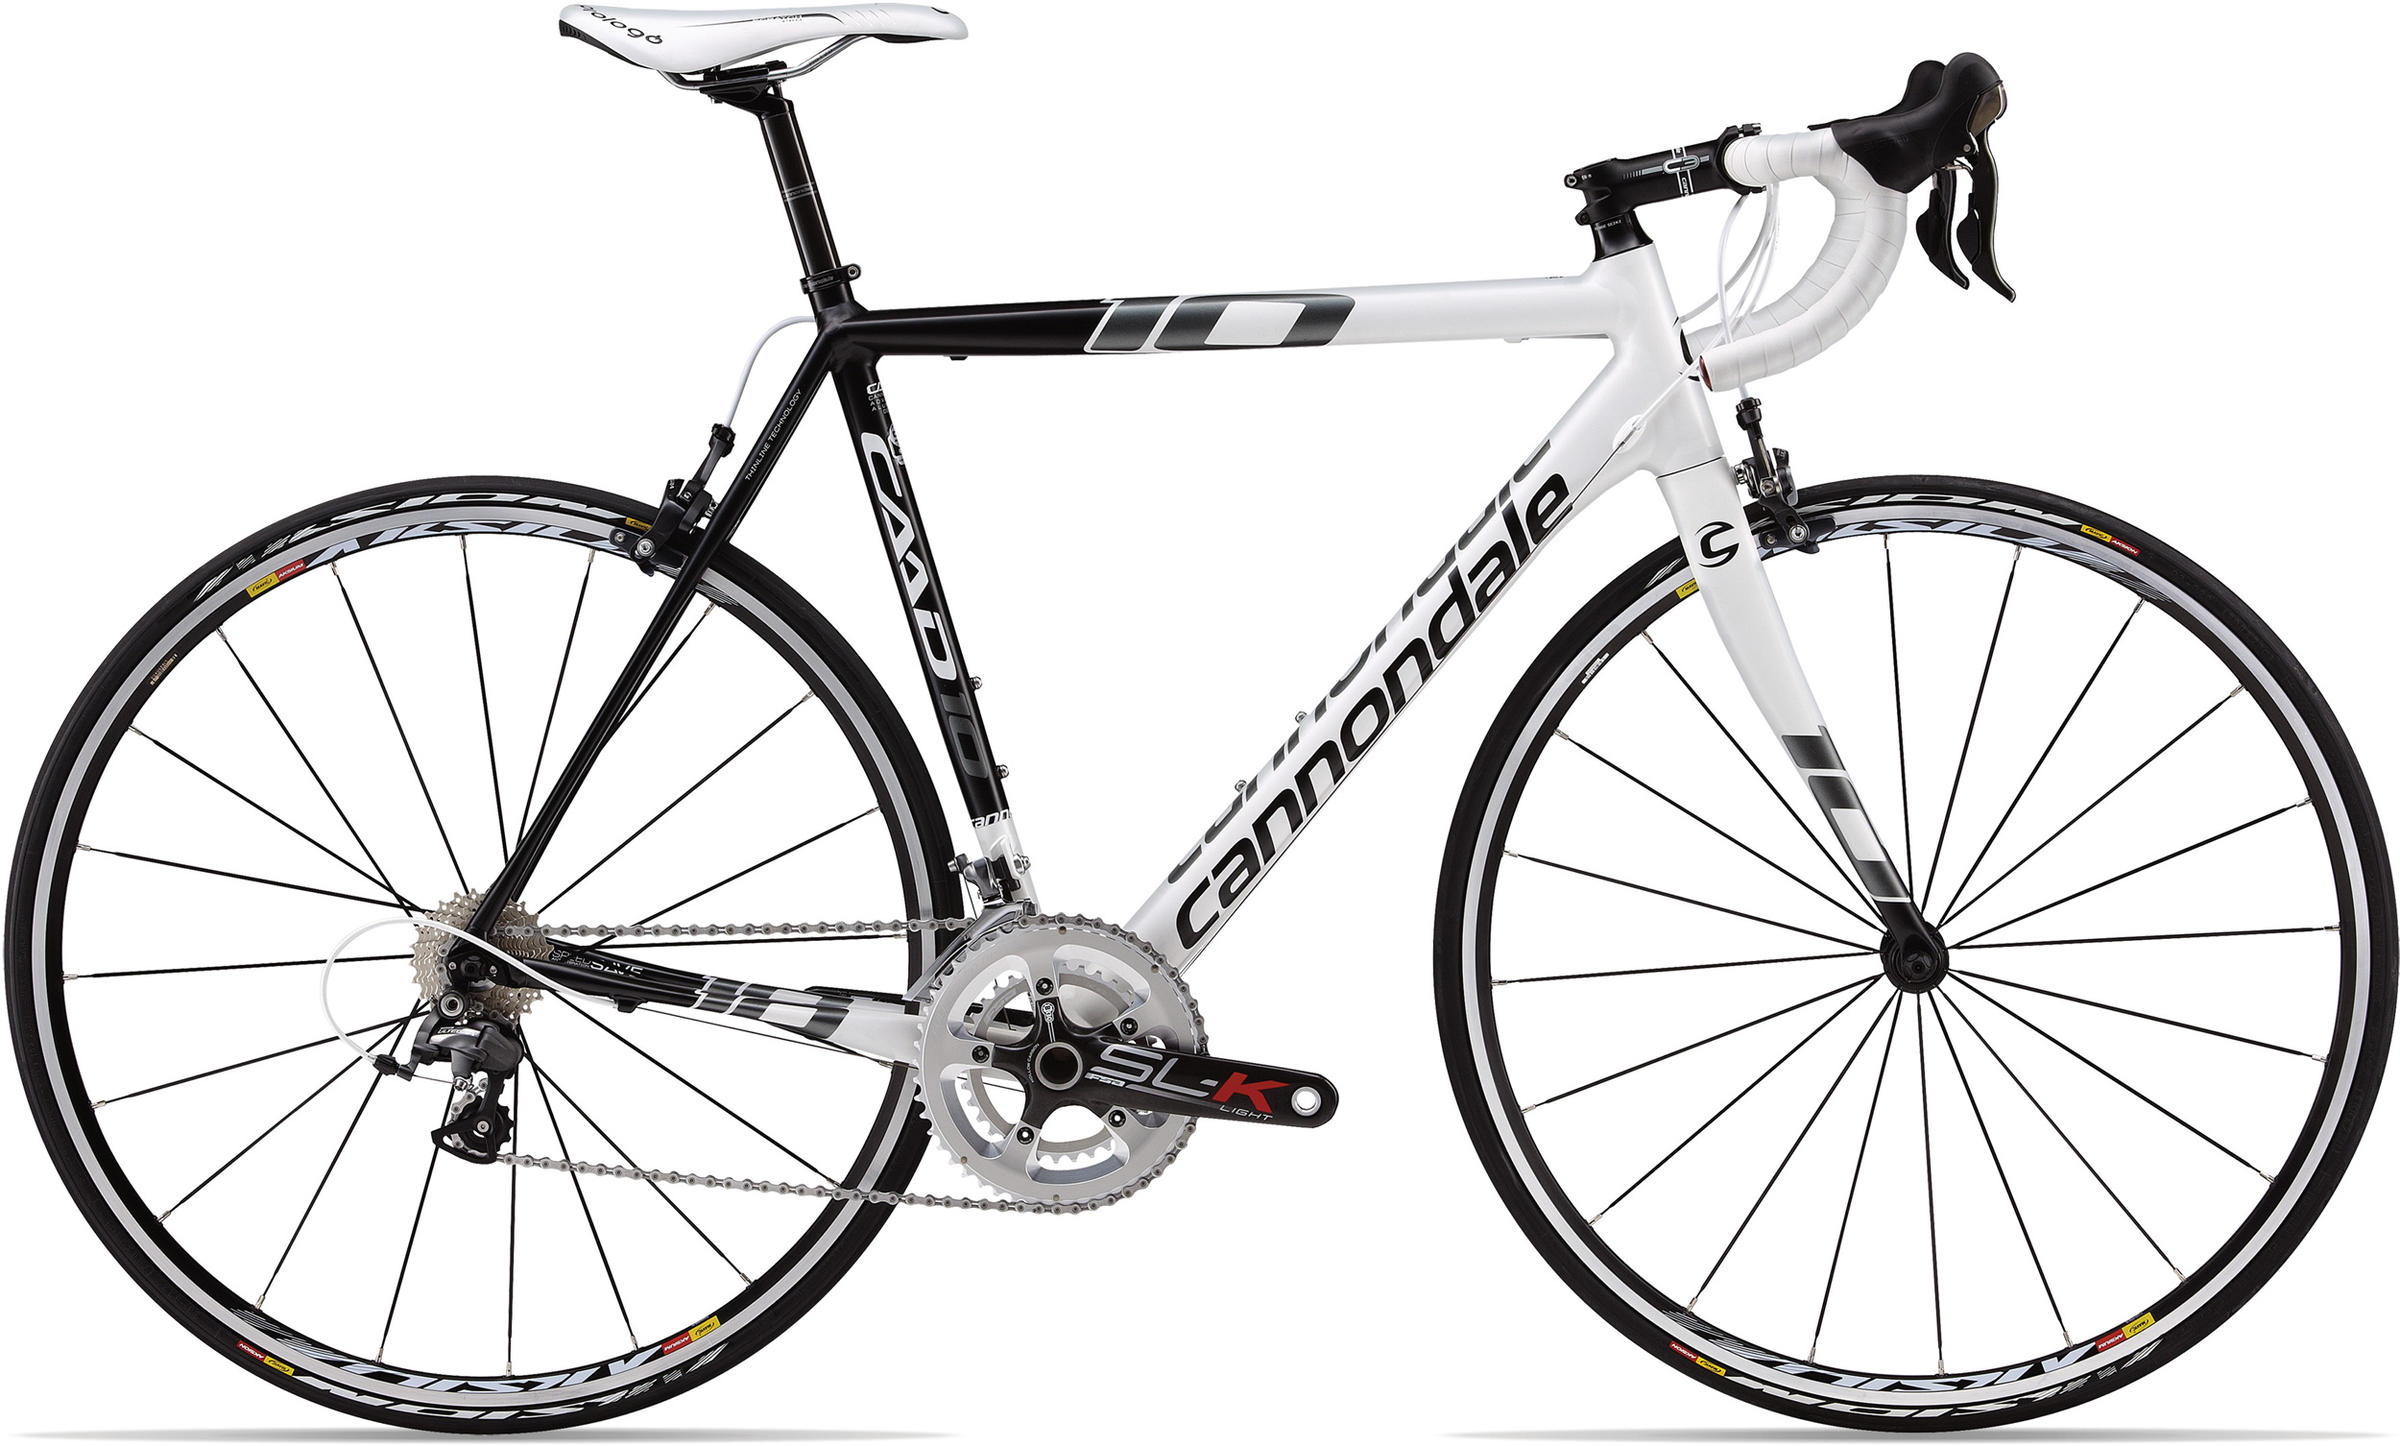 06f269fbce3 Cannondale CAAD10 3 Ultegra C - Ridgewood Cycle Shop 35 North Broad ...